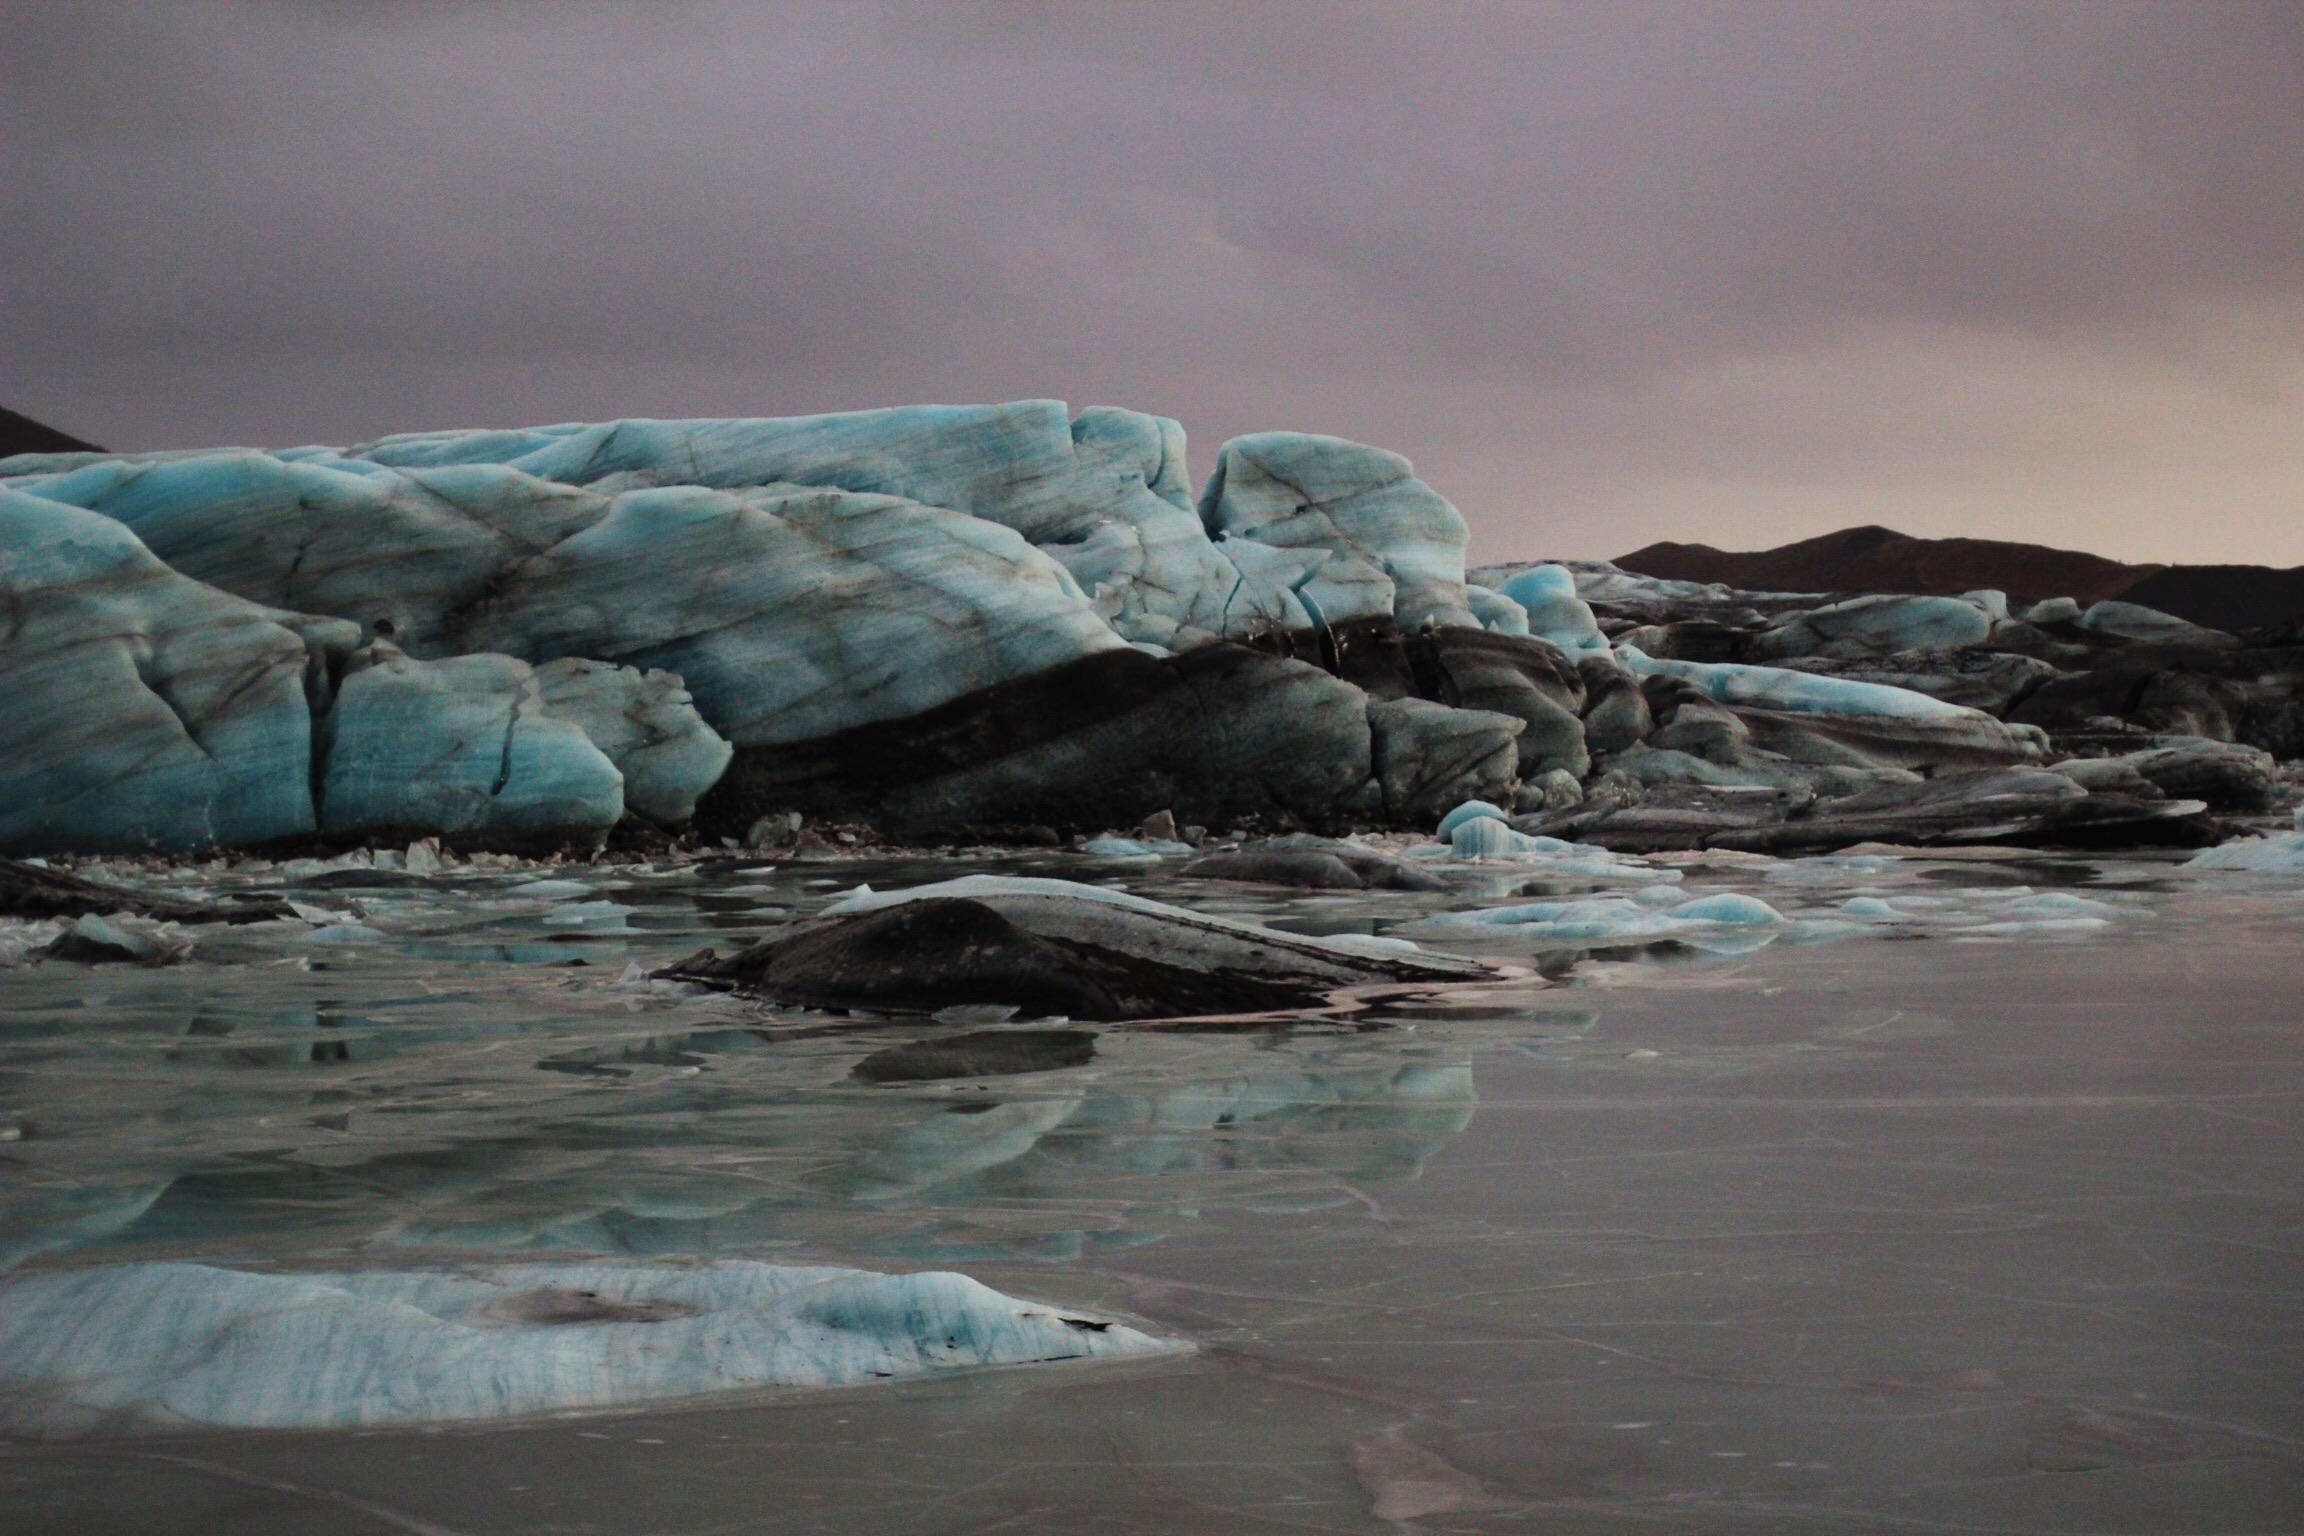 Otherworldly glacier views